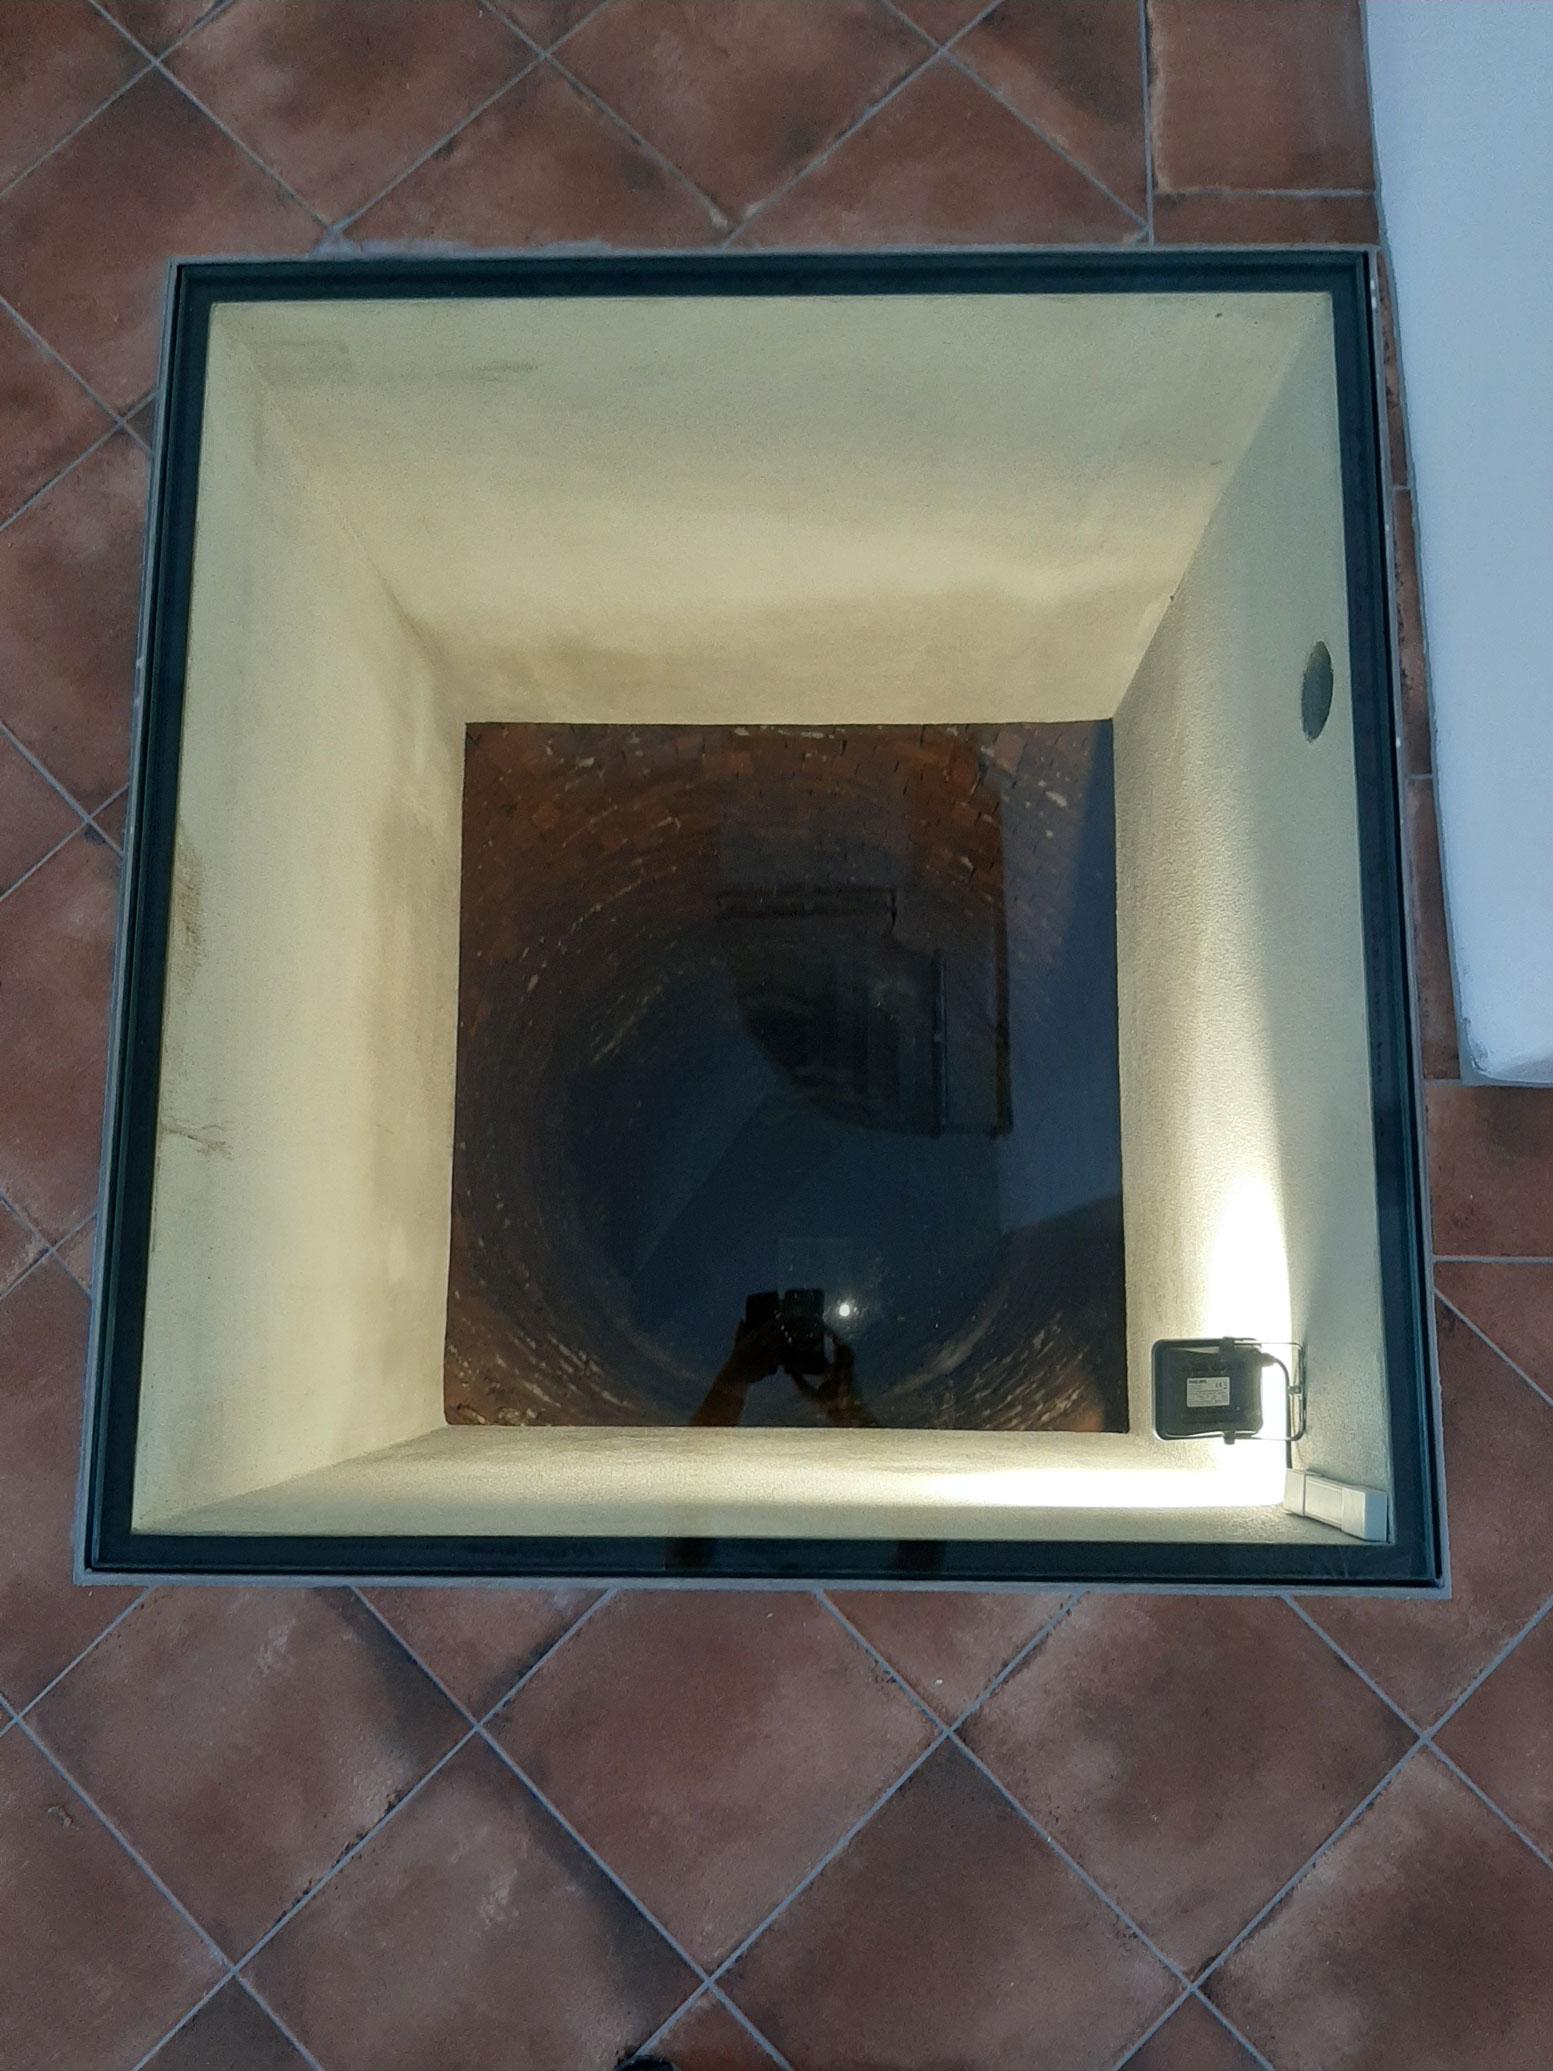 Sklenarstvi-Prerost-schody-a- pochozi-sklo (3)